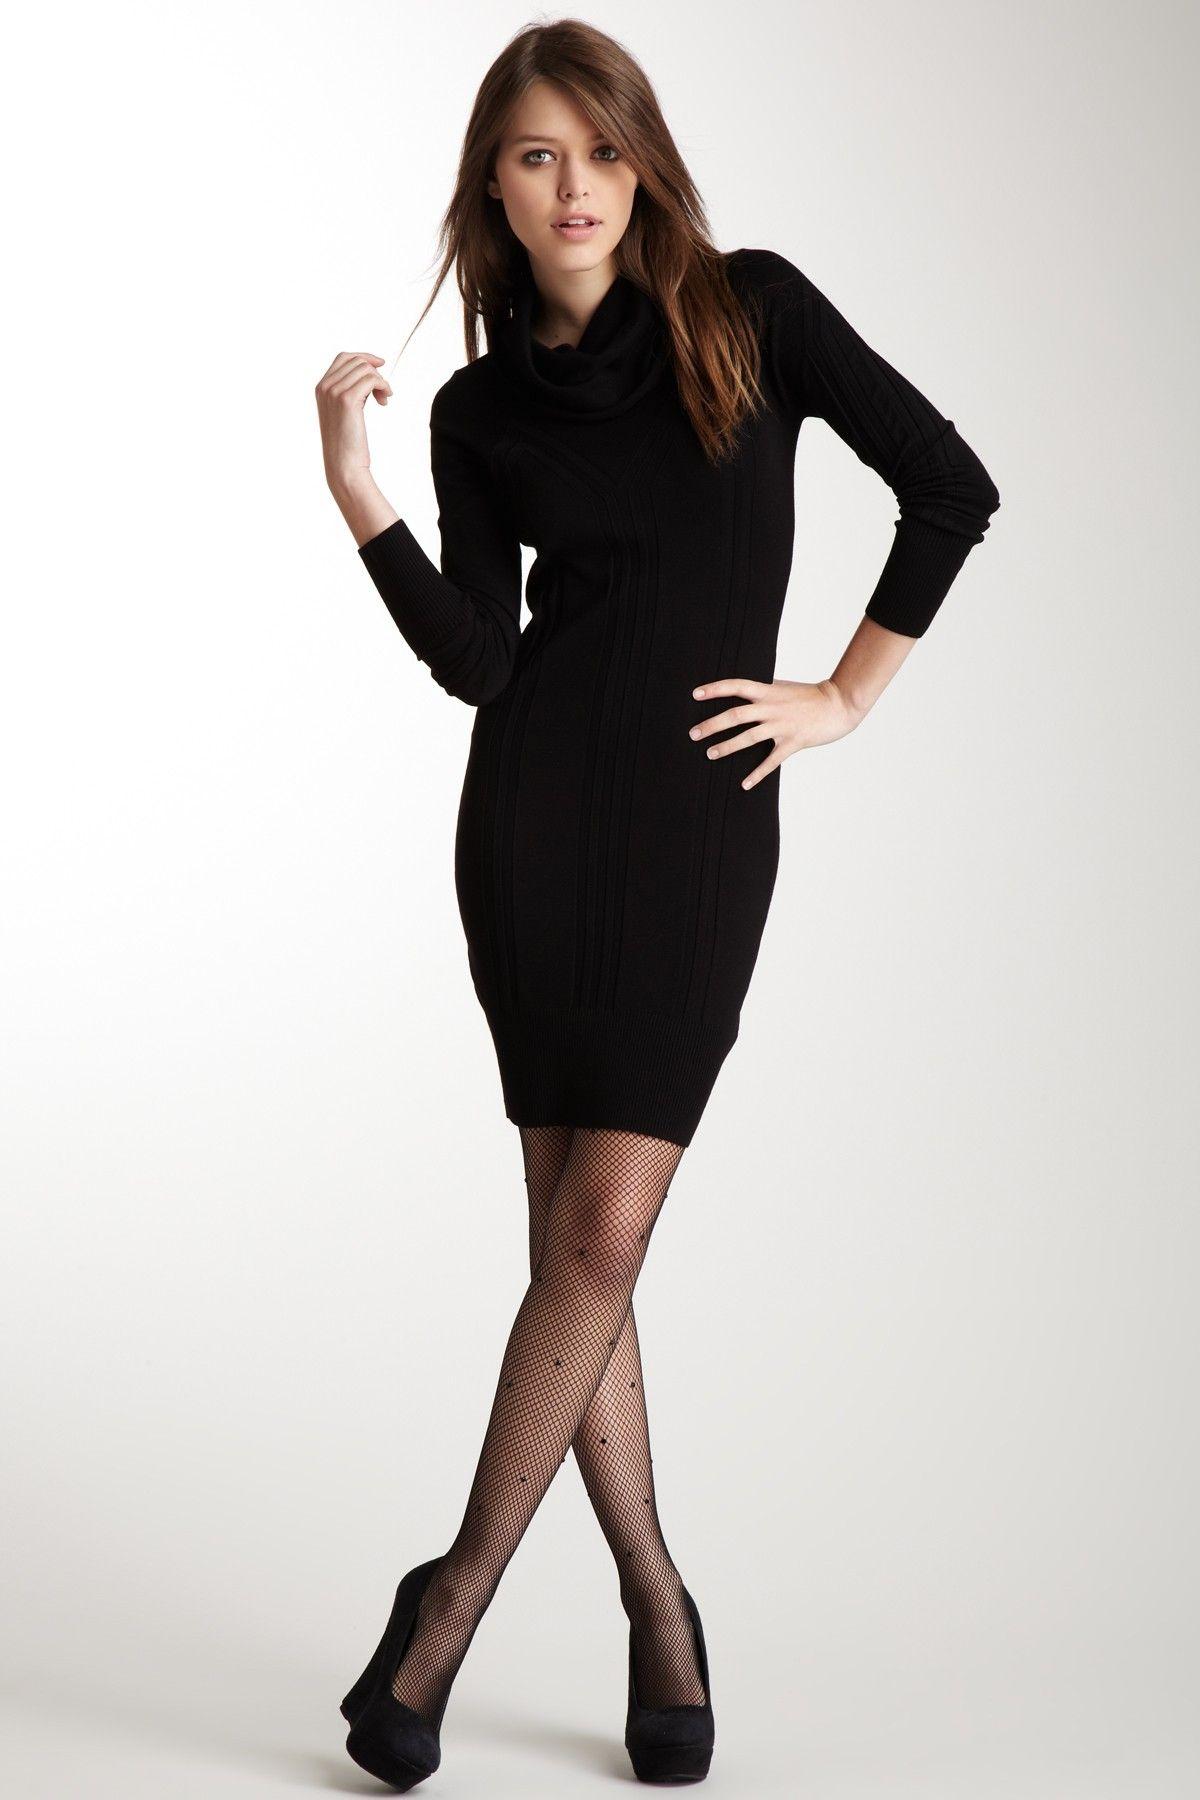 Yuka Cowl Neck Dress $29.00 $118.00 75% off